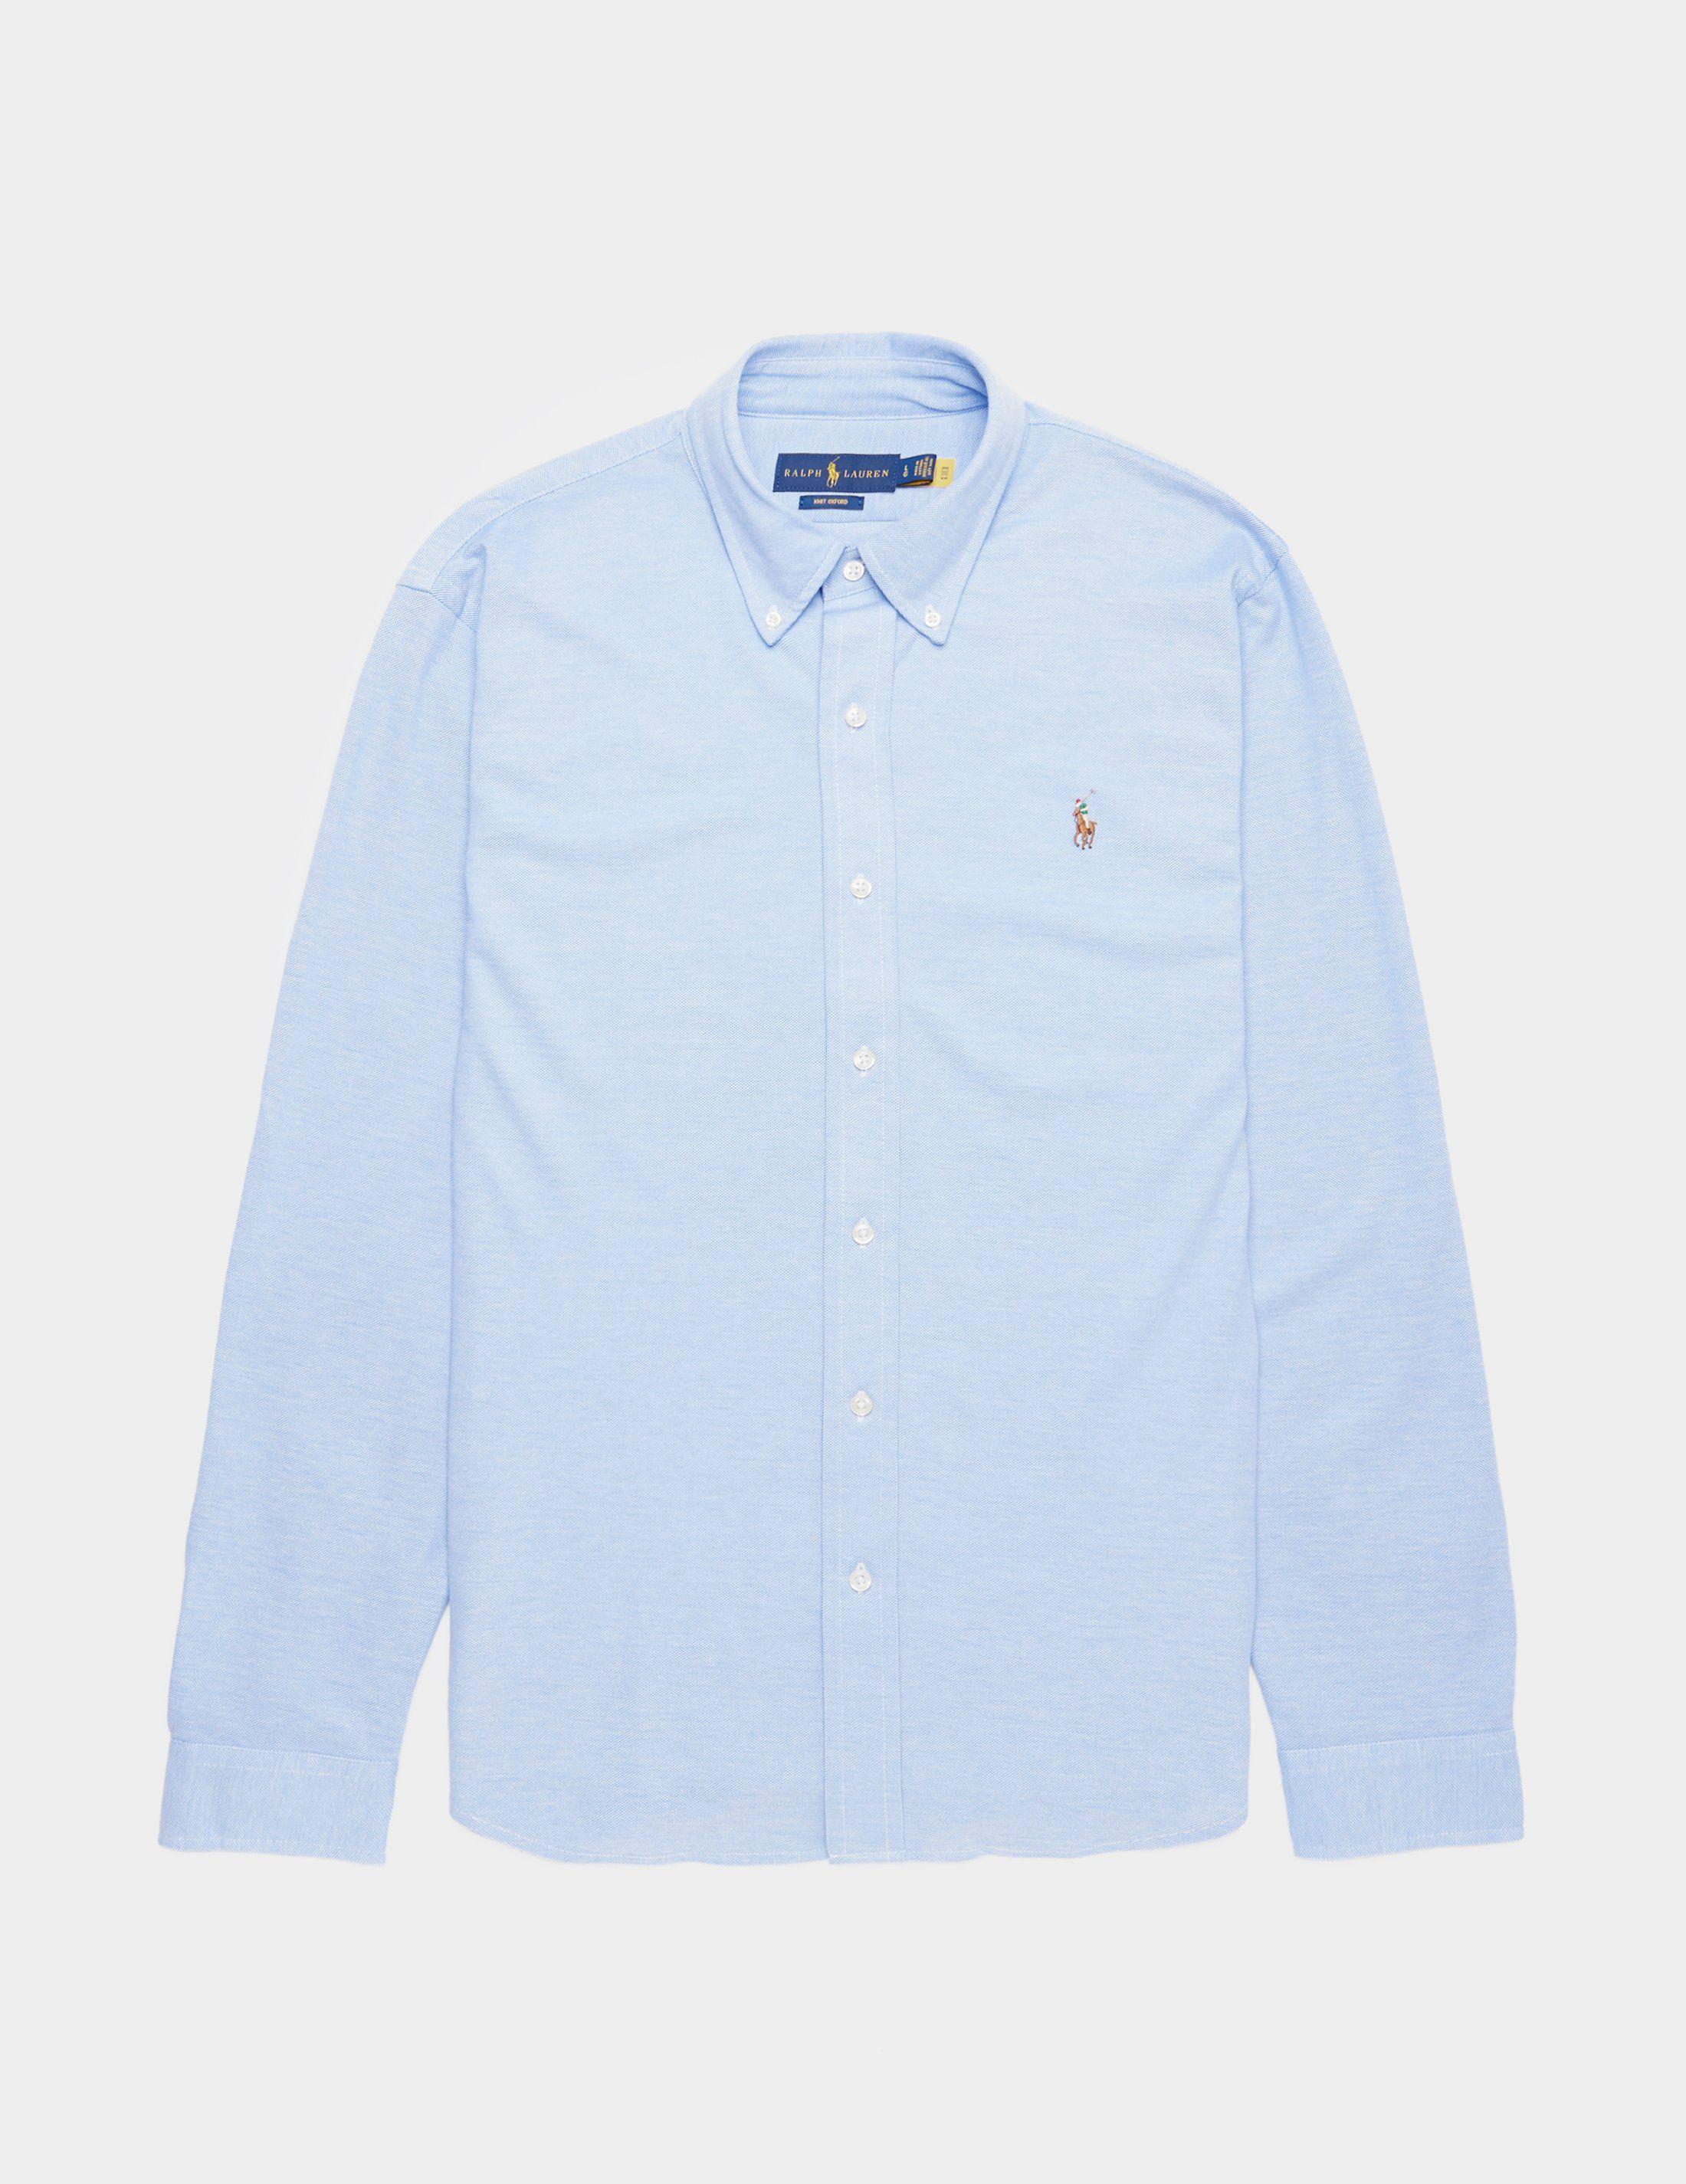 Polo Ralph Lauren Pique Long Sleeve Oxford Shirt - Online Exclusive